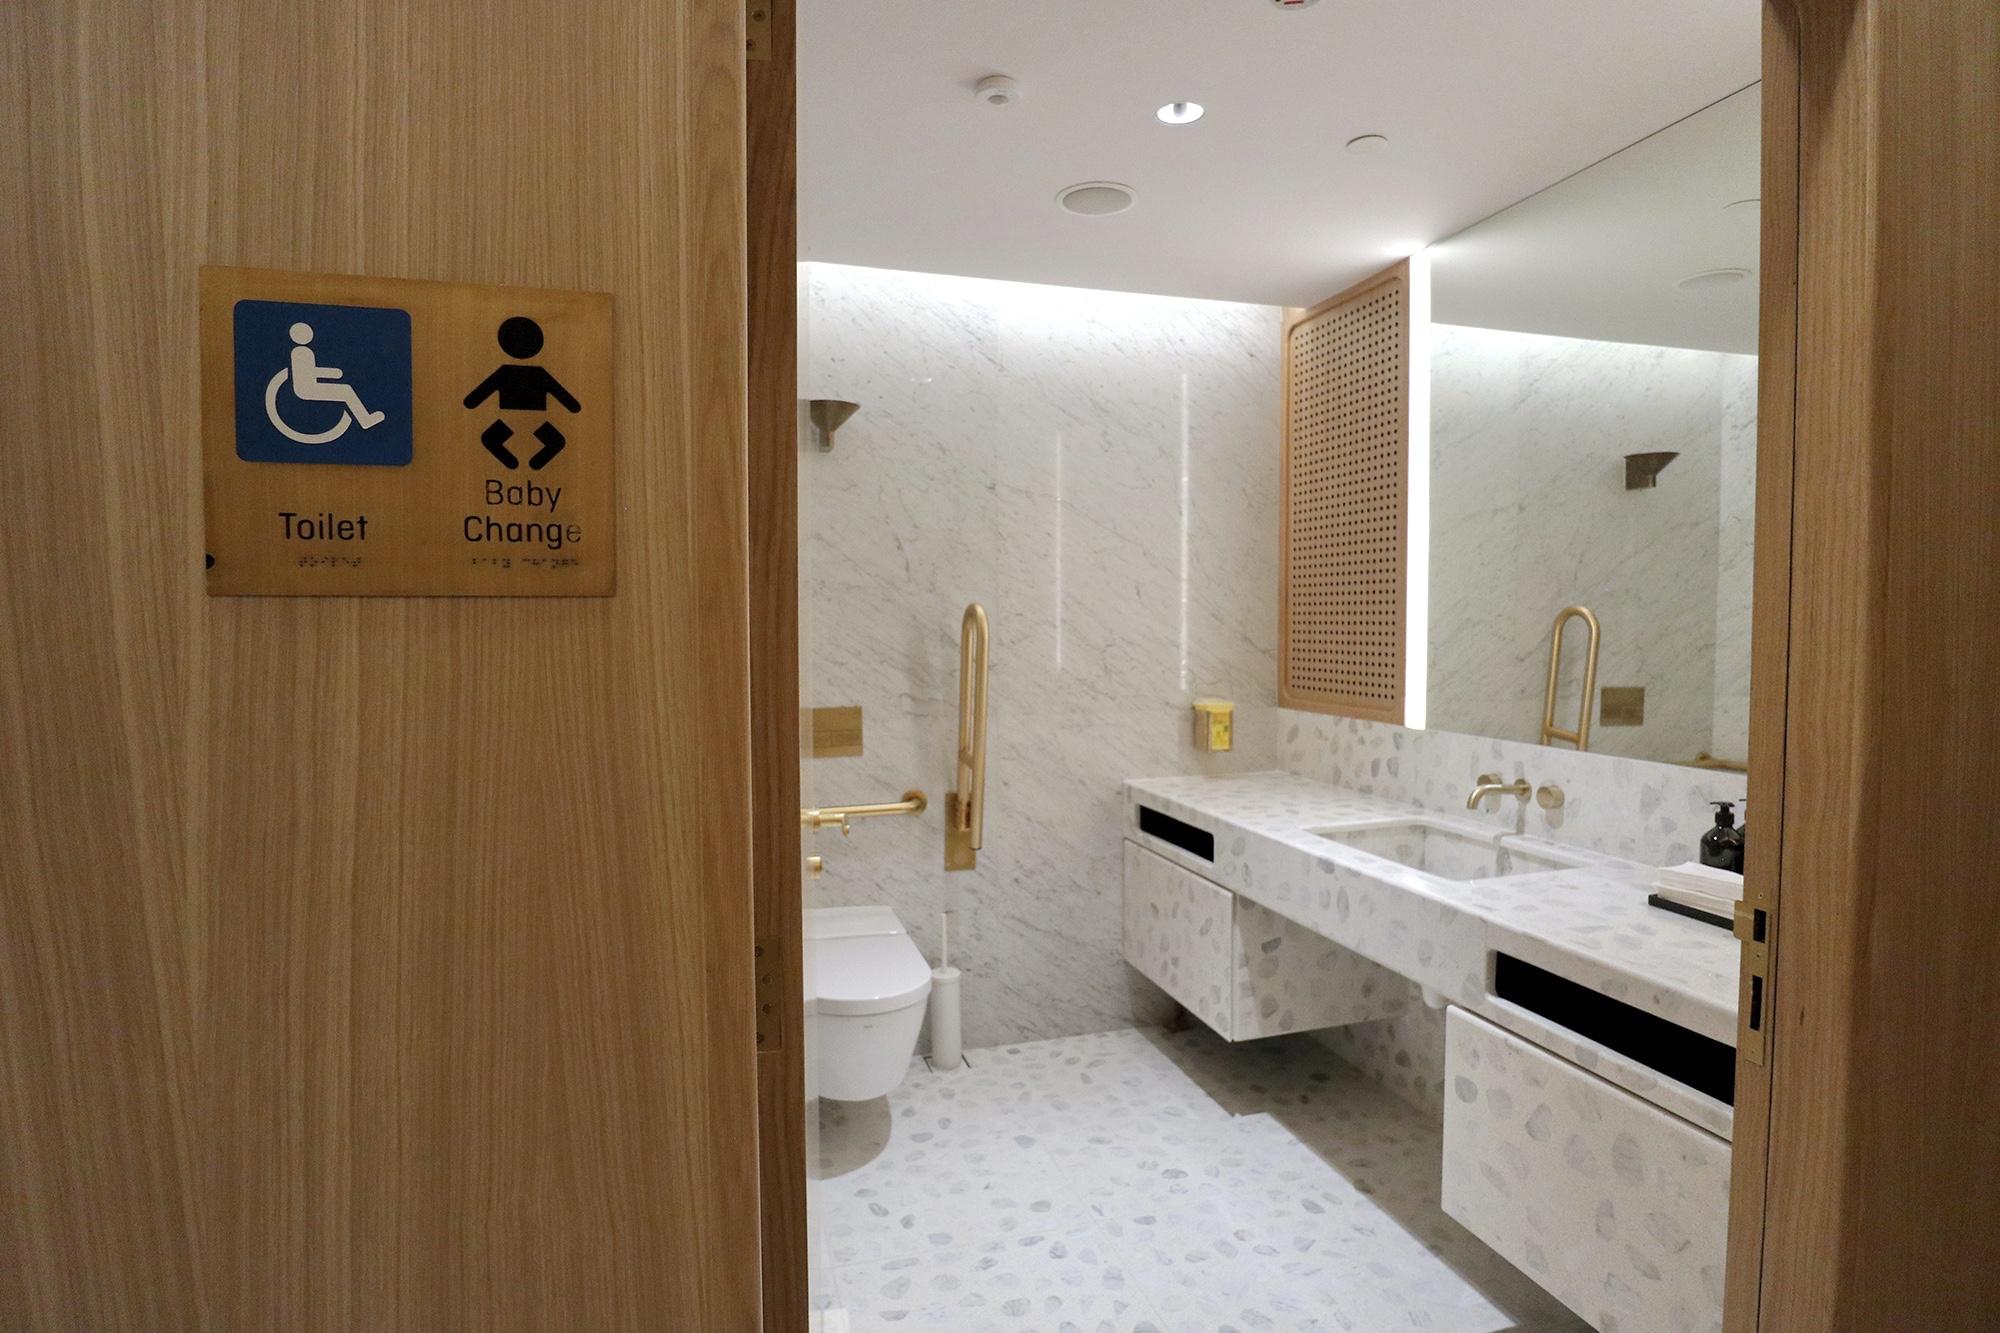 Toilet Baby Change